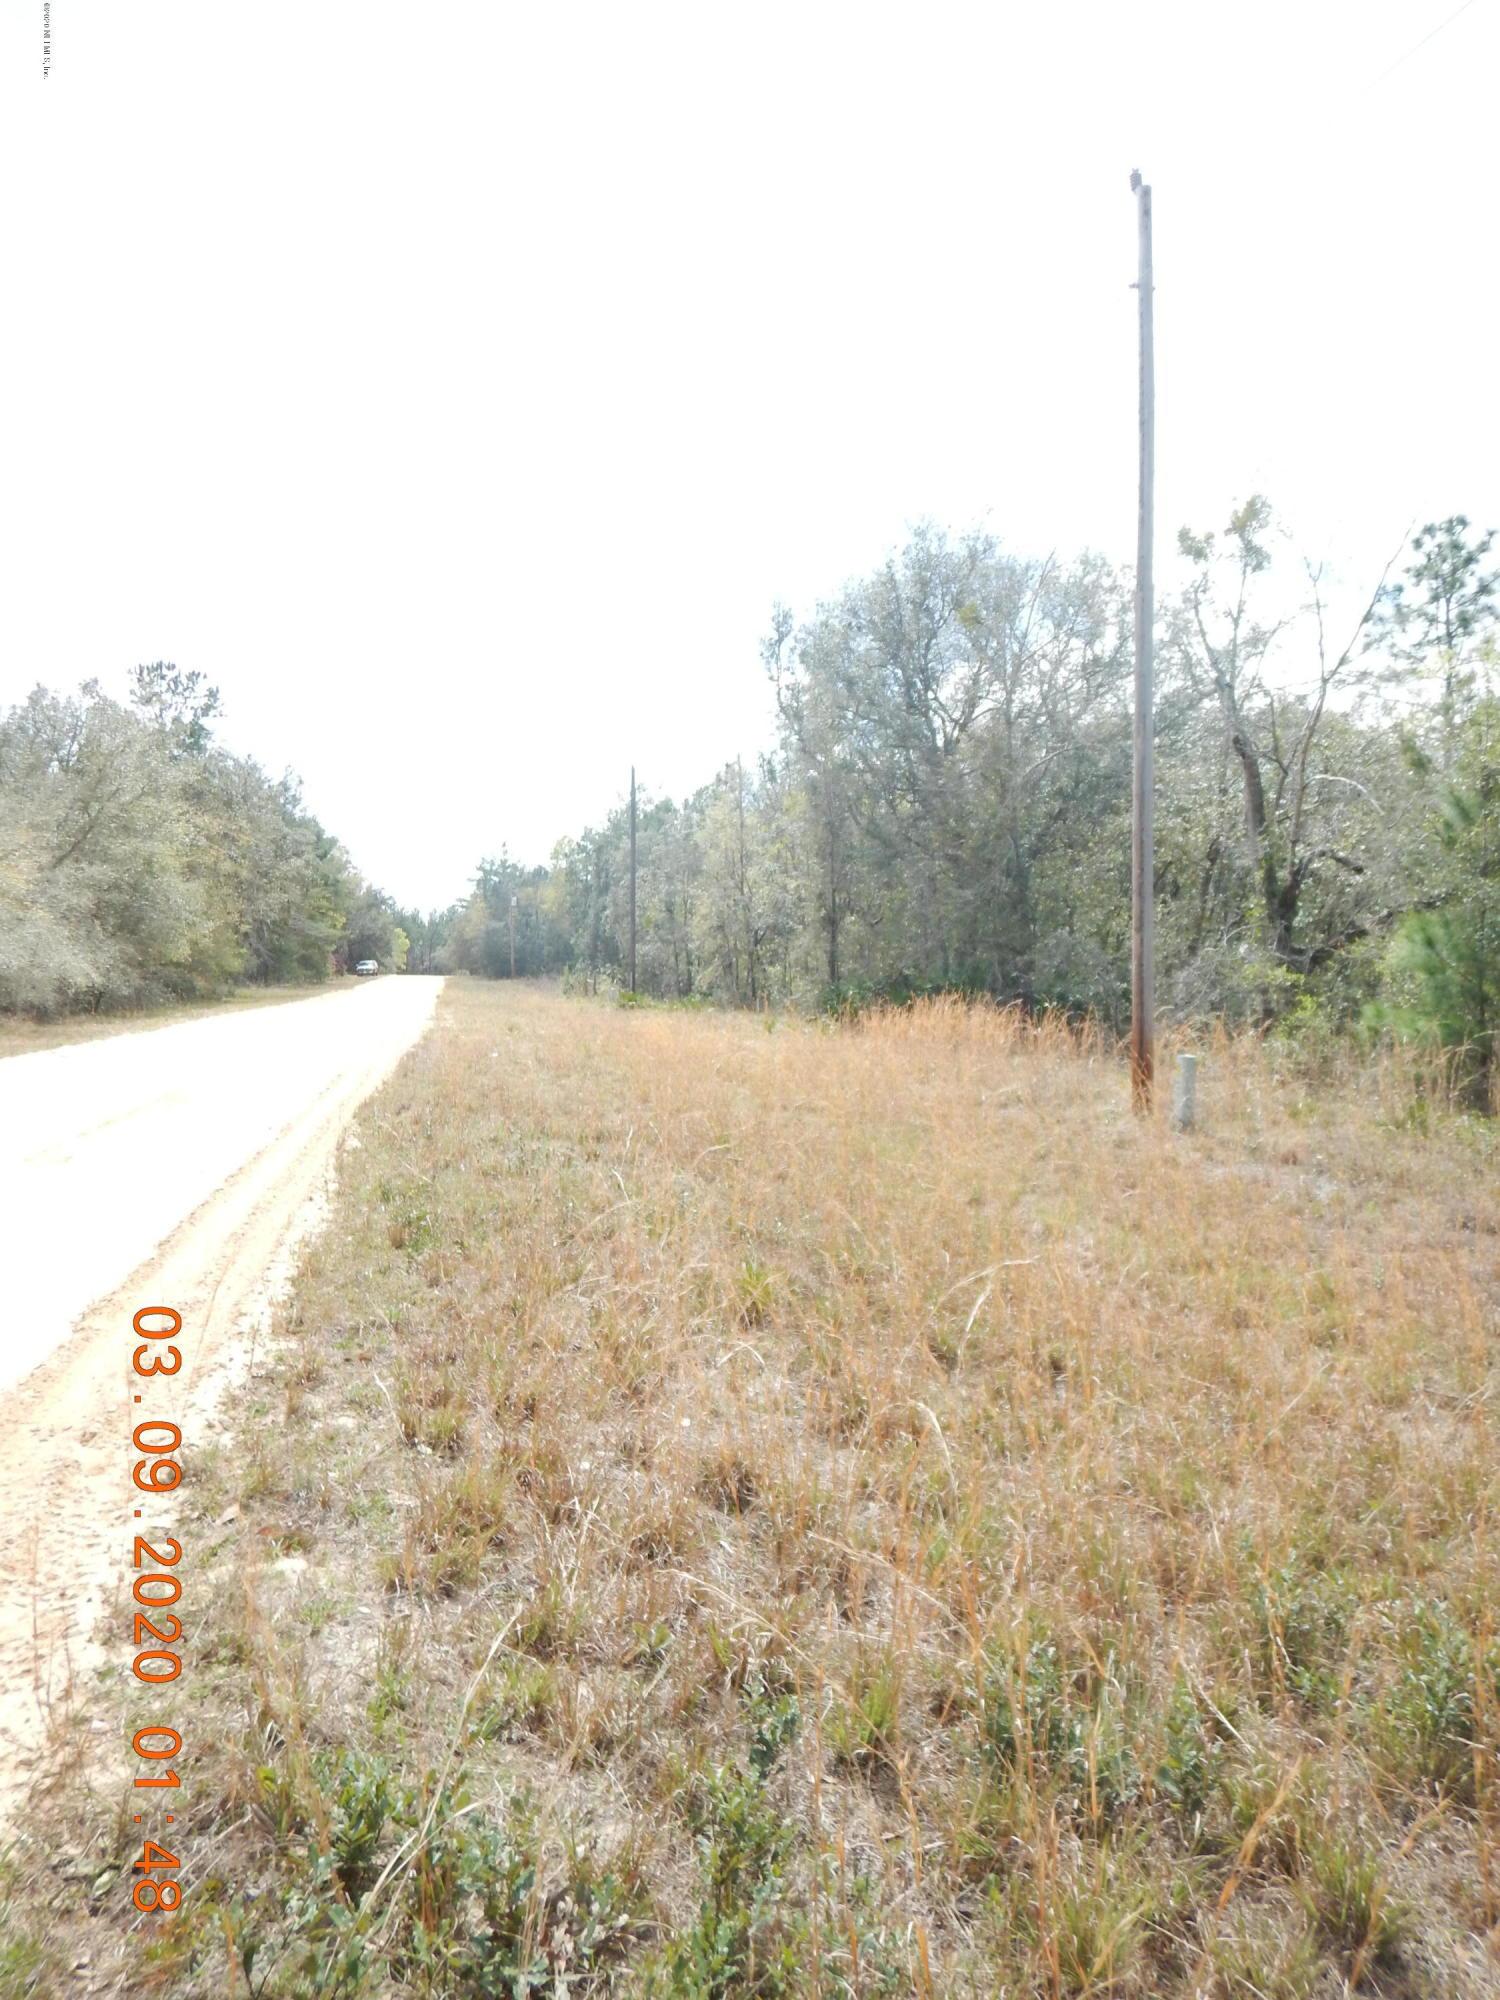 0 THERESA, INTERLACHEN, FLORIDA 32148, ,Vacant land,For sale,THERESA,1043096